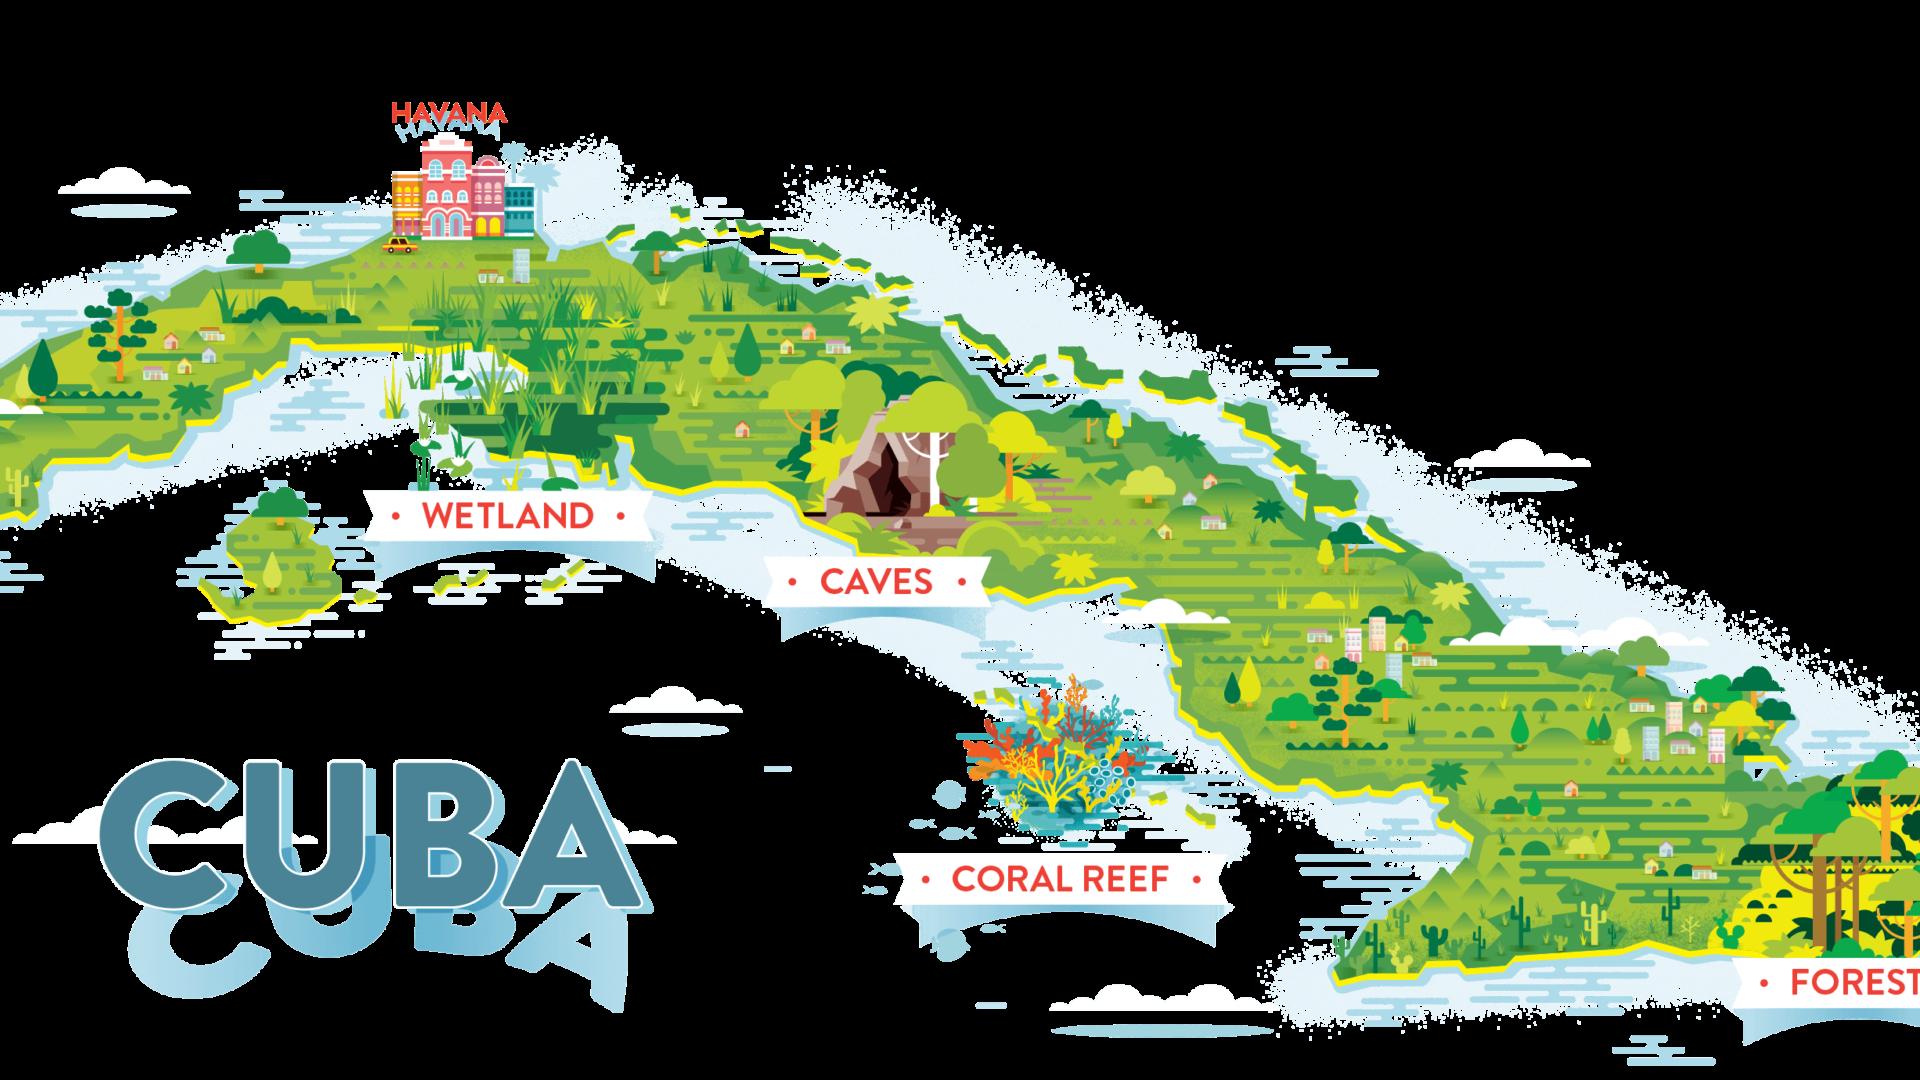 Vacanze a Cuba